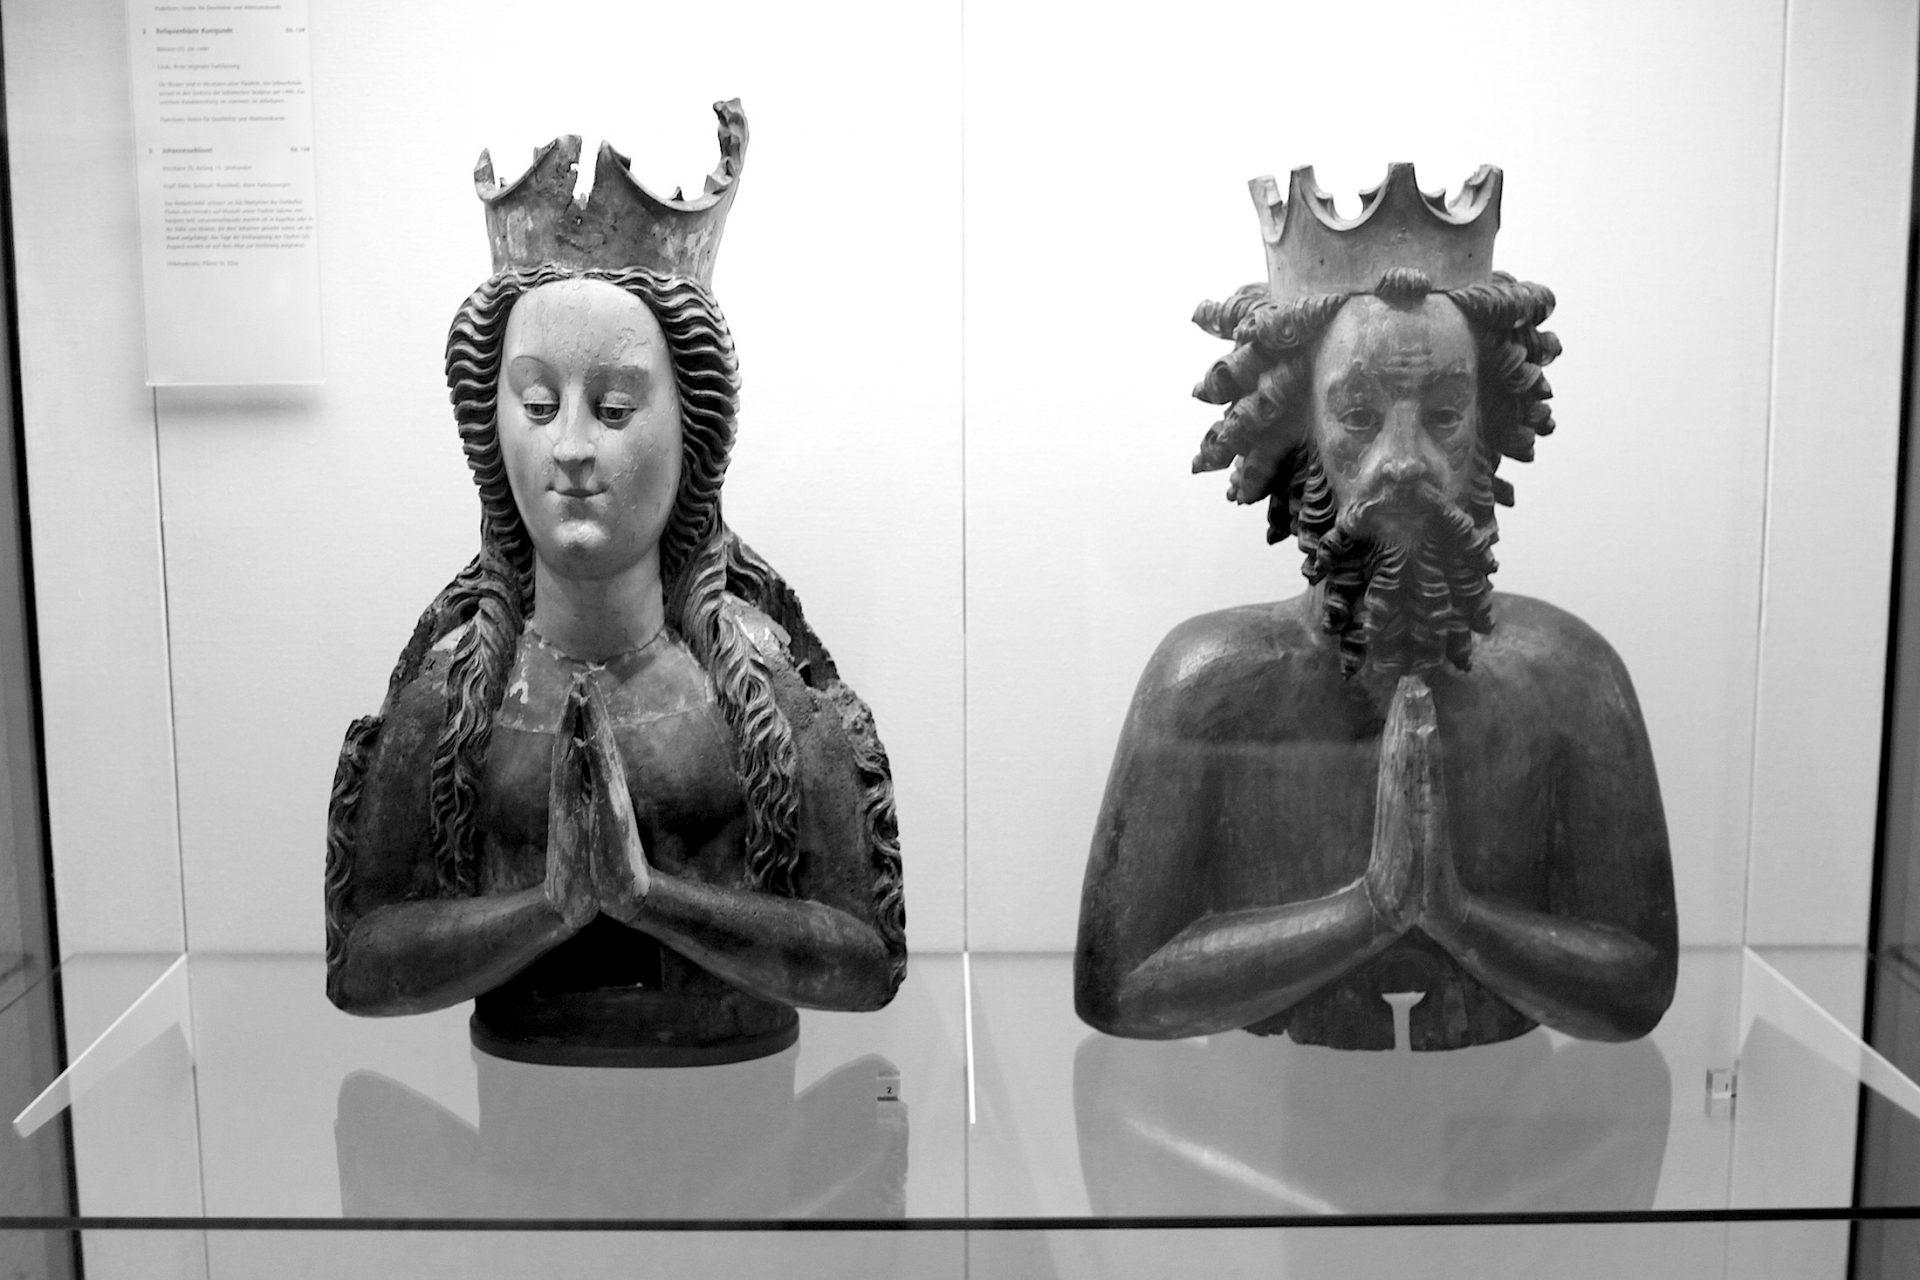 Perlen der Provinz: Diözesanmuseum Paderborn, Teil 1